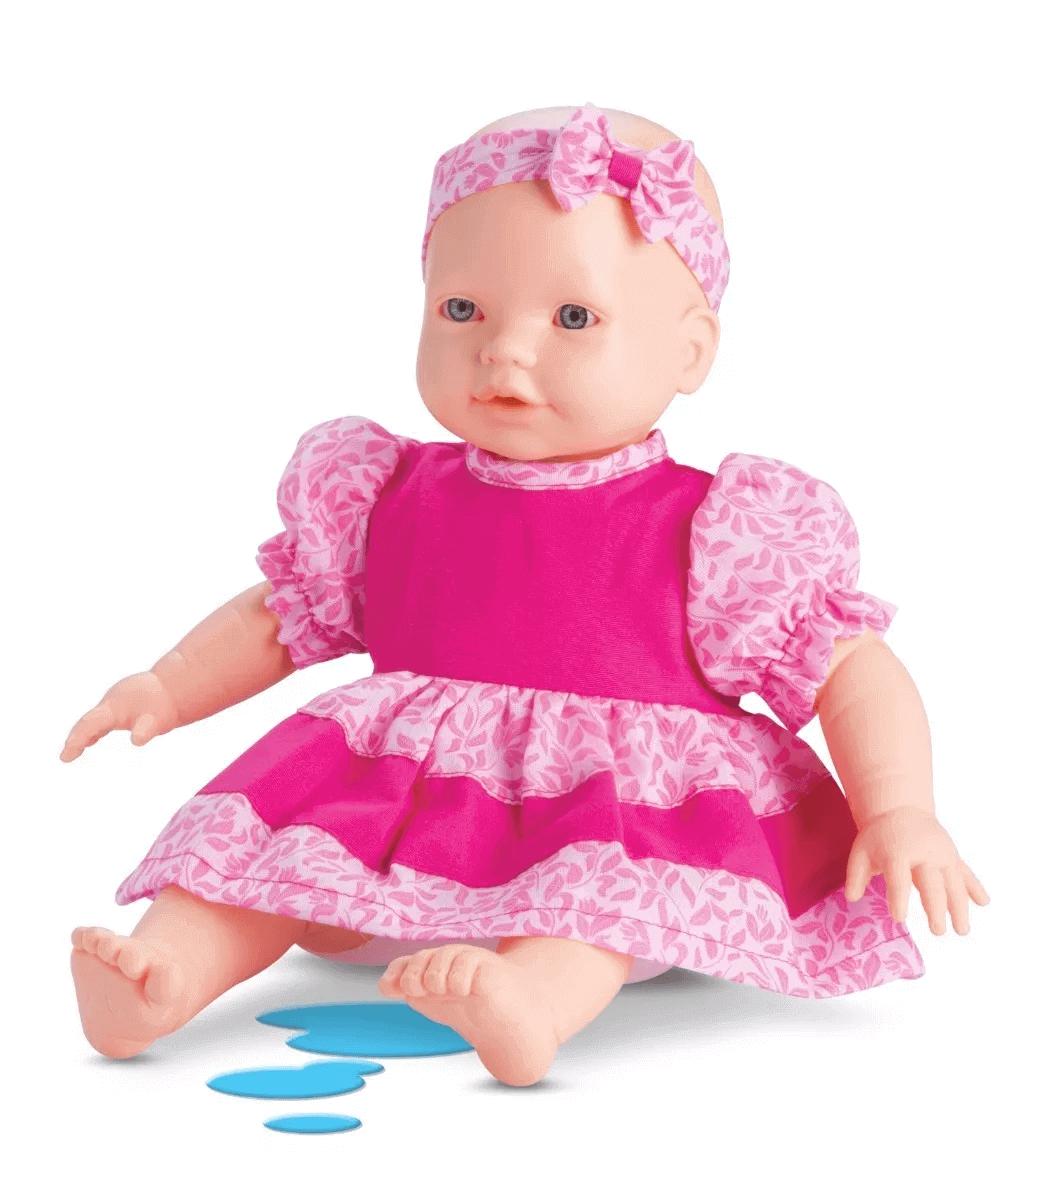 Boneca Vinil Mini Bebe Xixi 4995 Omg